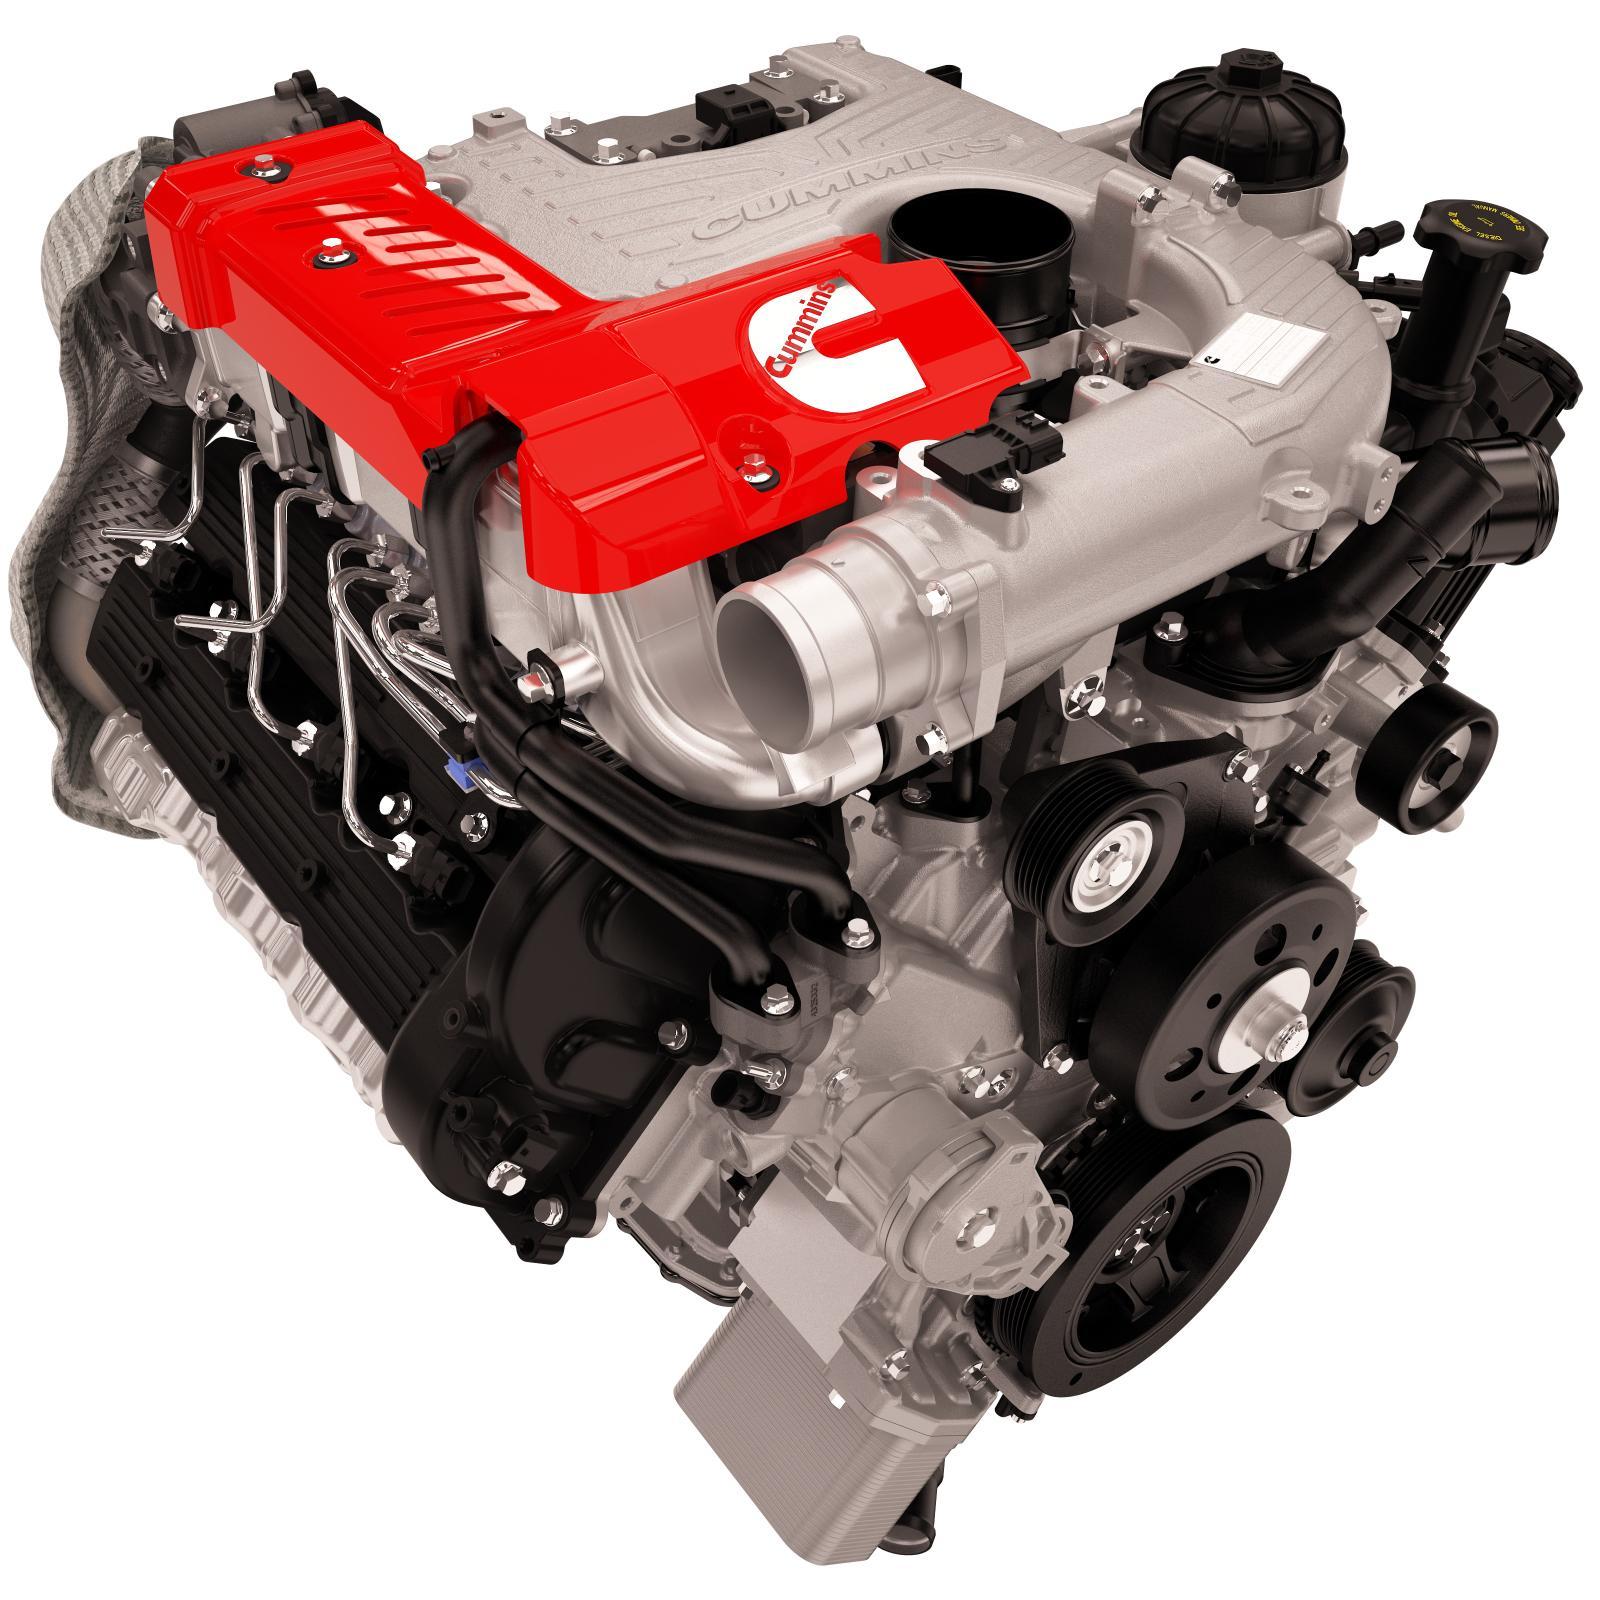 Nissan 5.0 Cummins >> Cummins Diesel Engine of 2016 Nissan Titan XD is a Technological Showcase - autoevolution